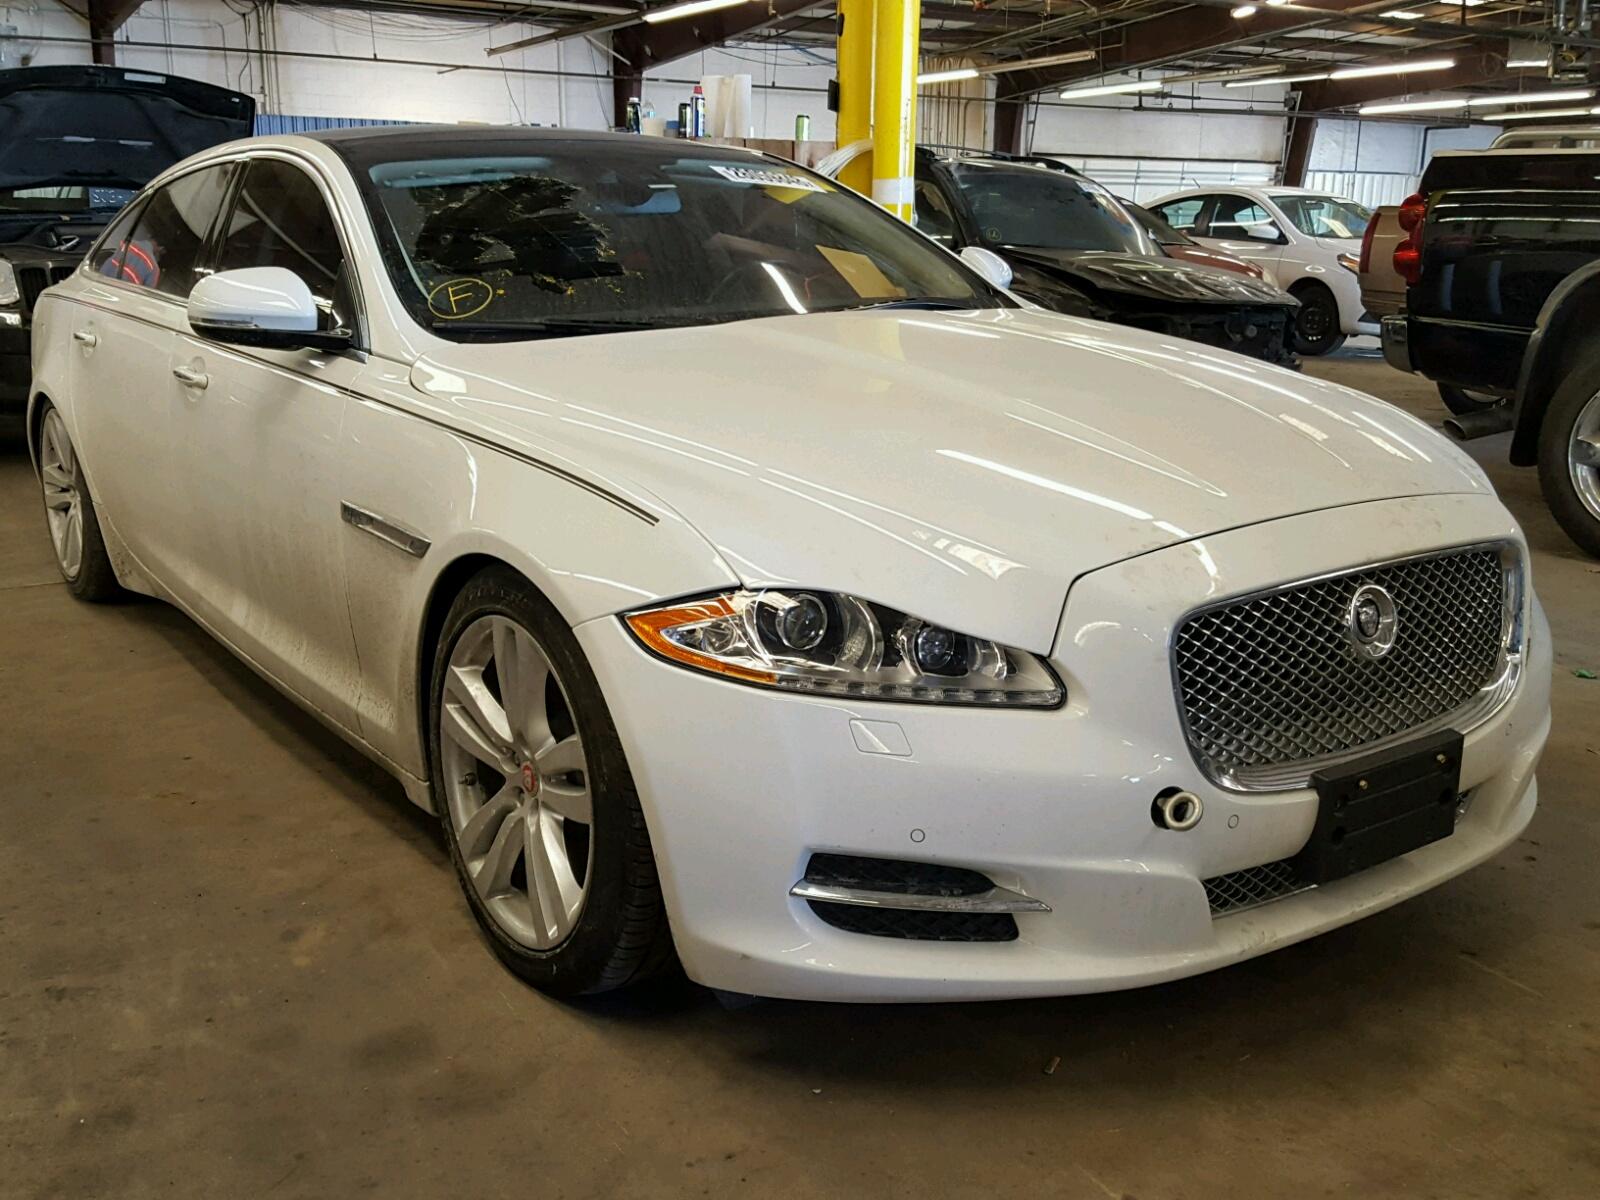 xjl photo xj features sedan photos rear wheel drive reviews jaguar price base